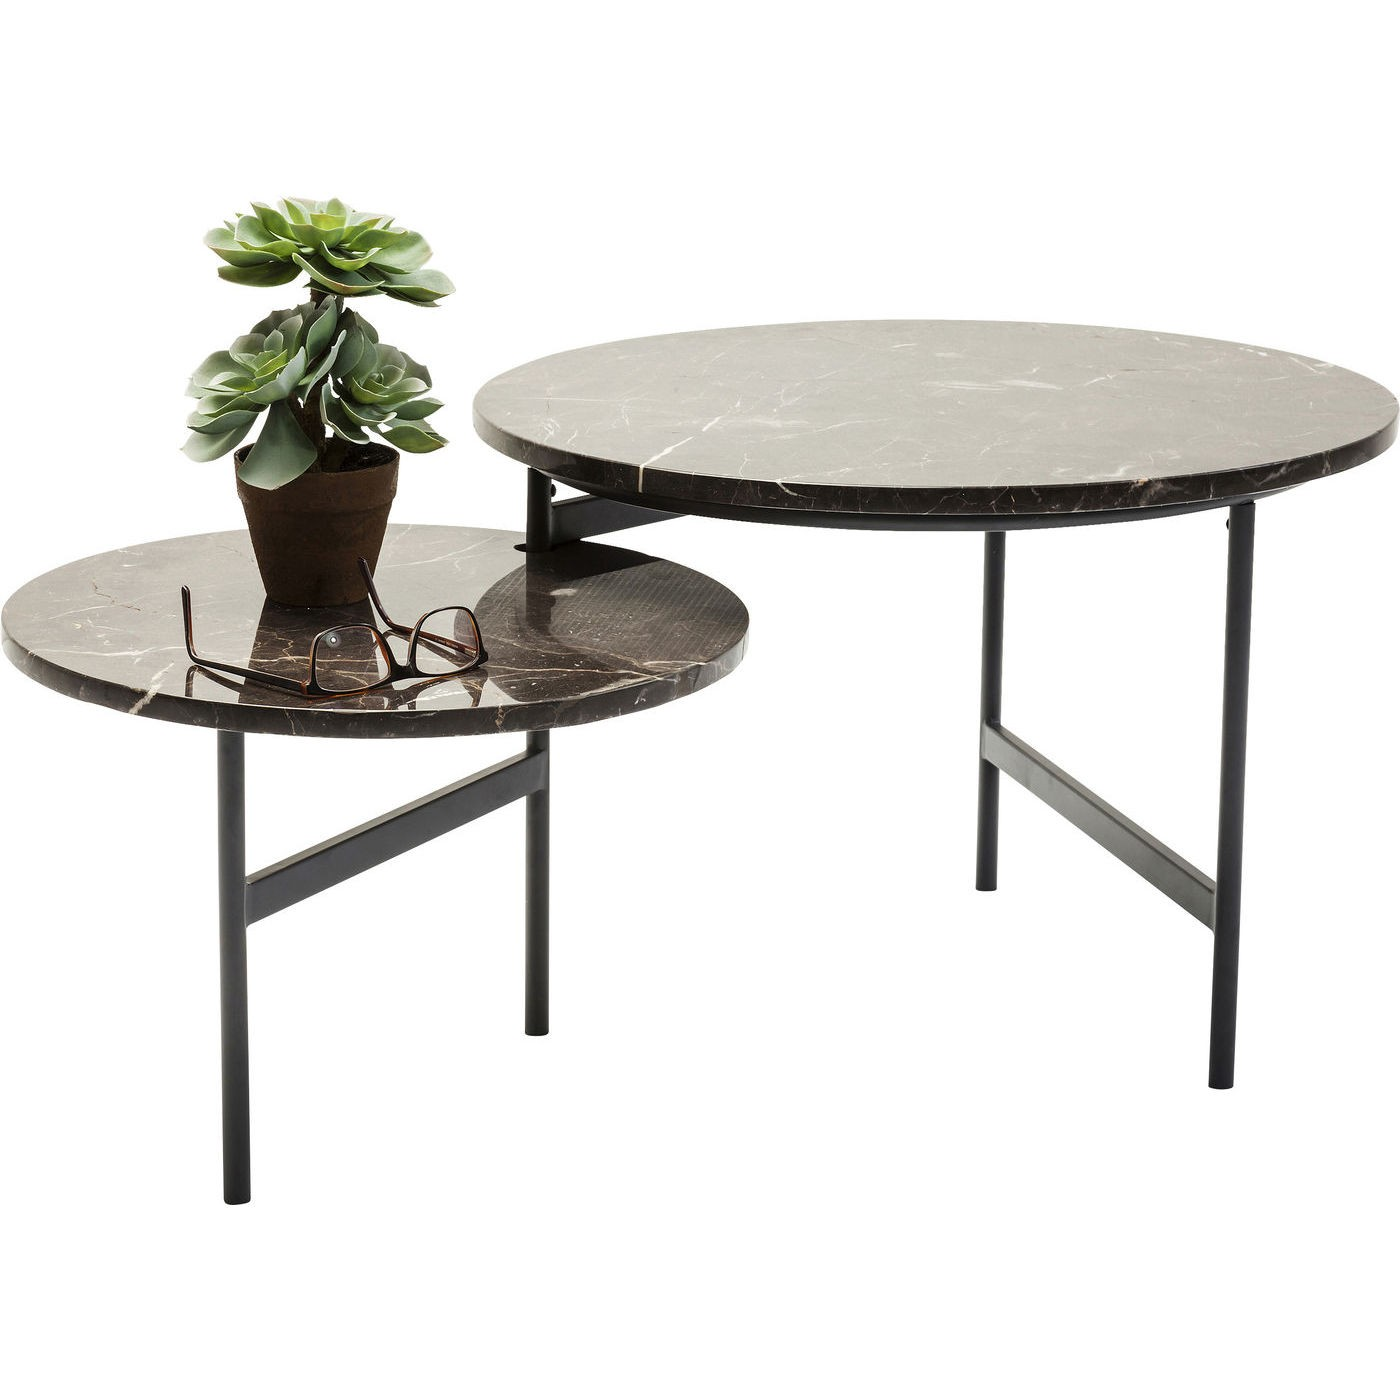 KARE DESIGN Monocle sofabord - brun marmor m. stålben, 110x60